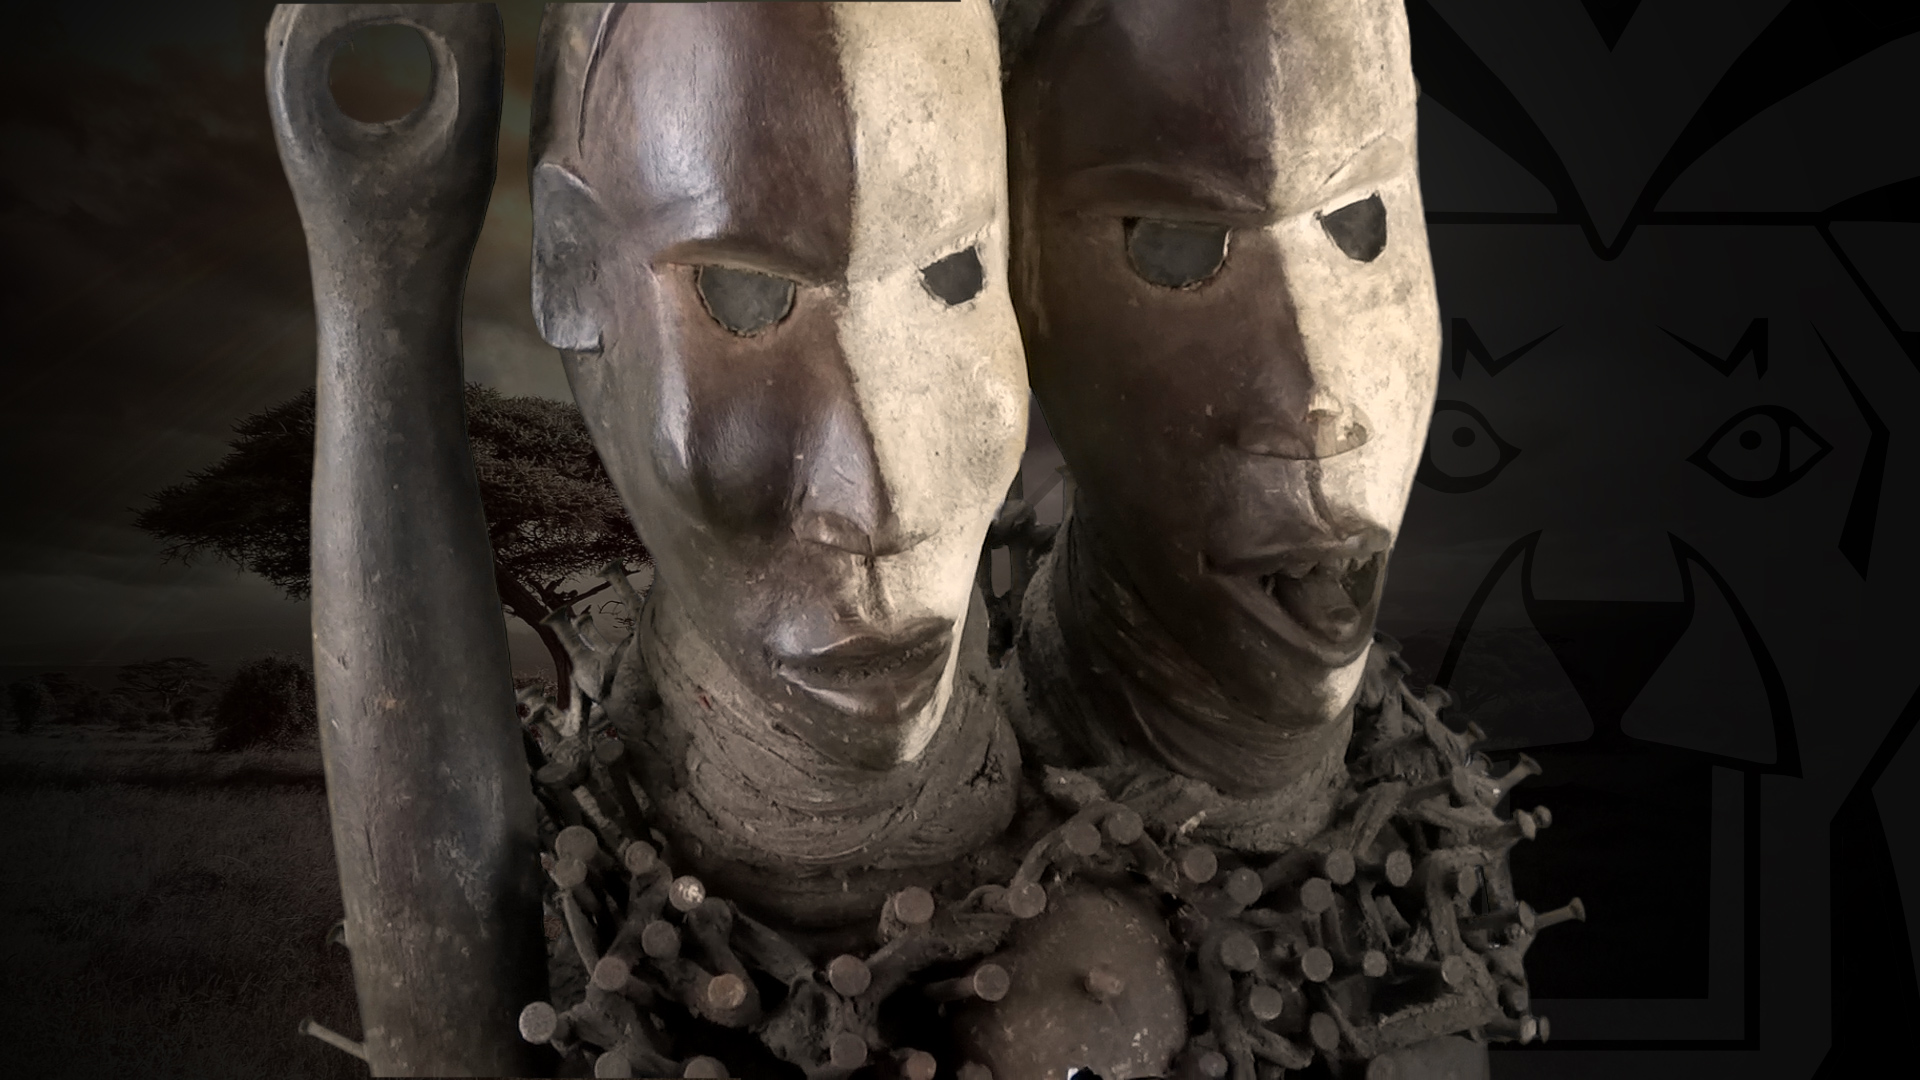 doppelkopf schutzfigur der bakongo dr kongo congo afrika 70cm. Black Bedroom Furniture Sets. Home Design Ideas